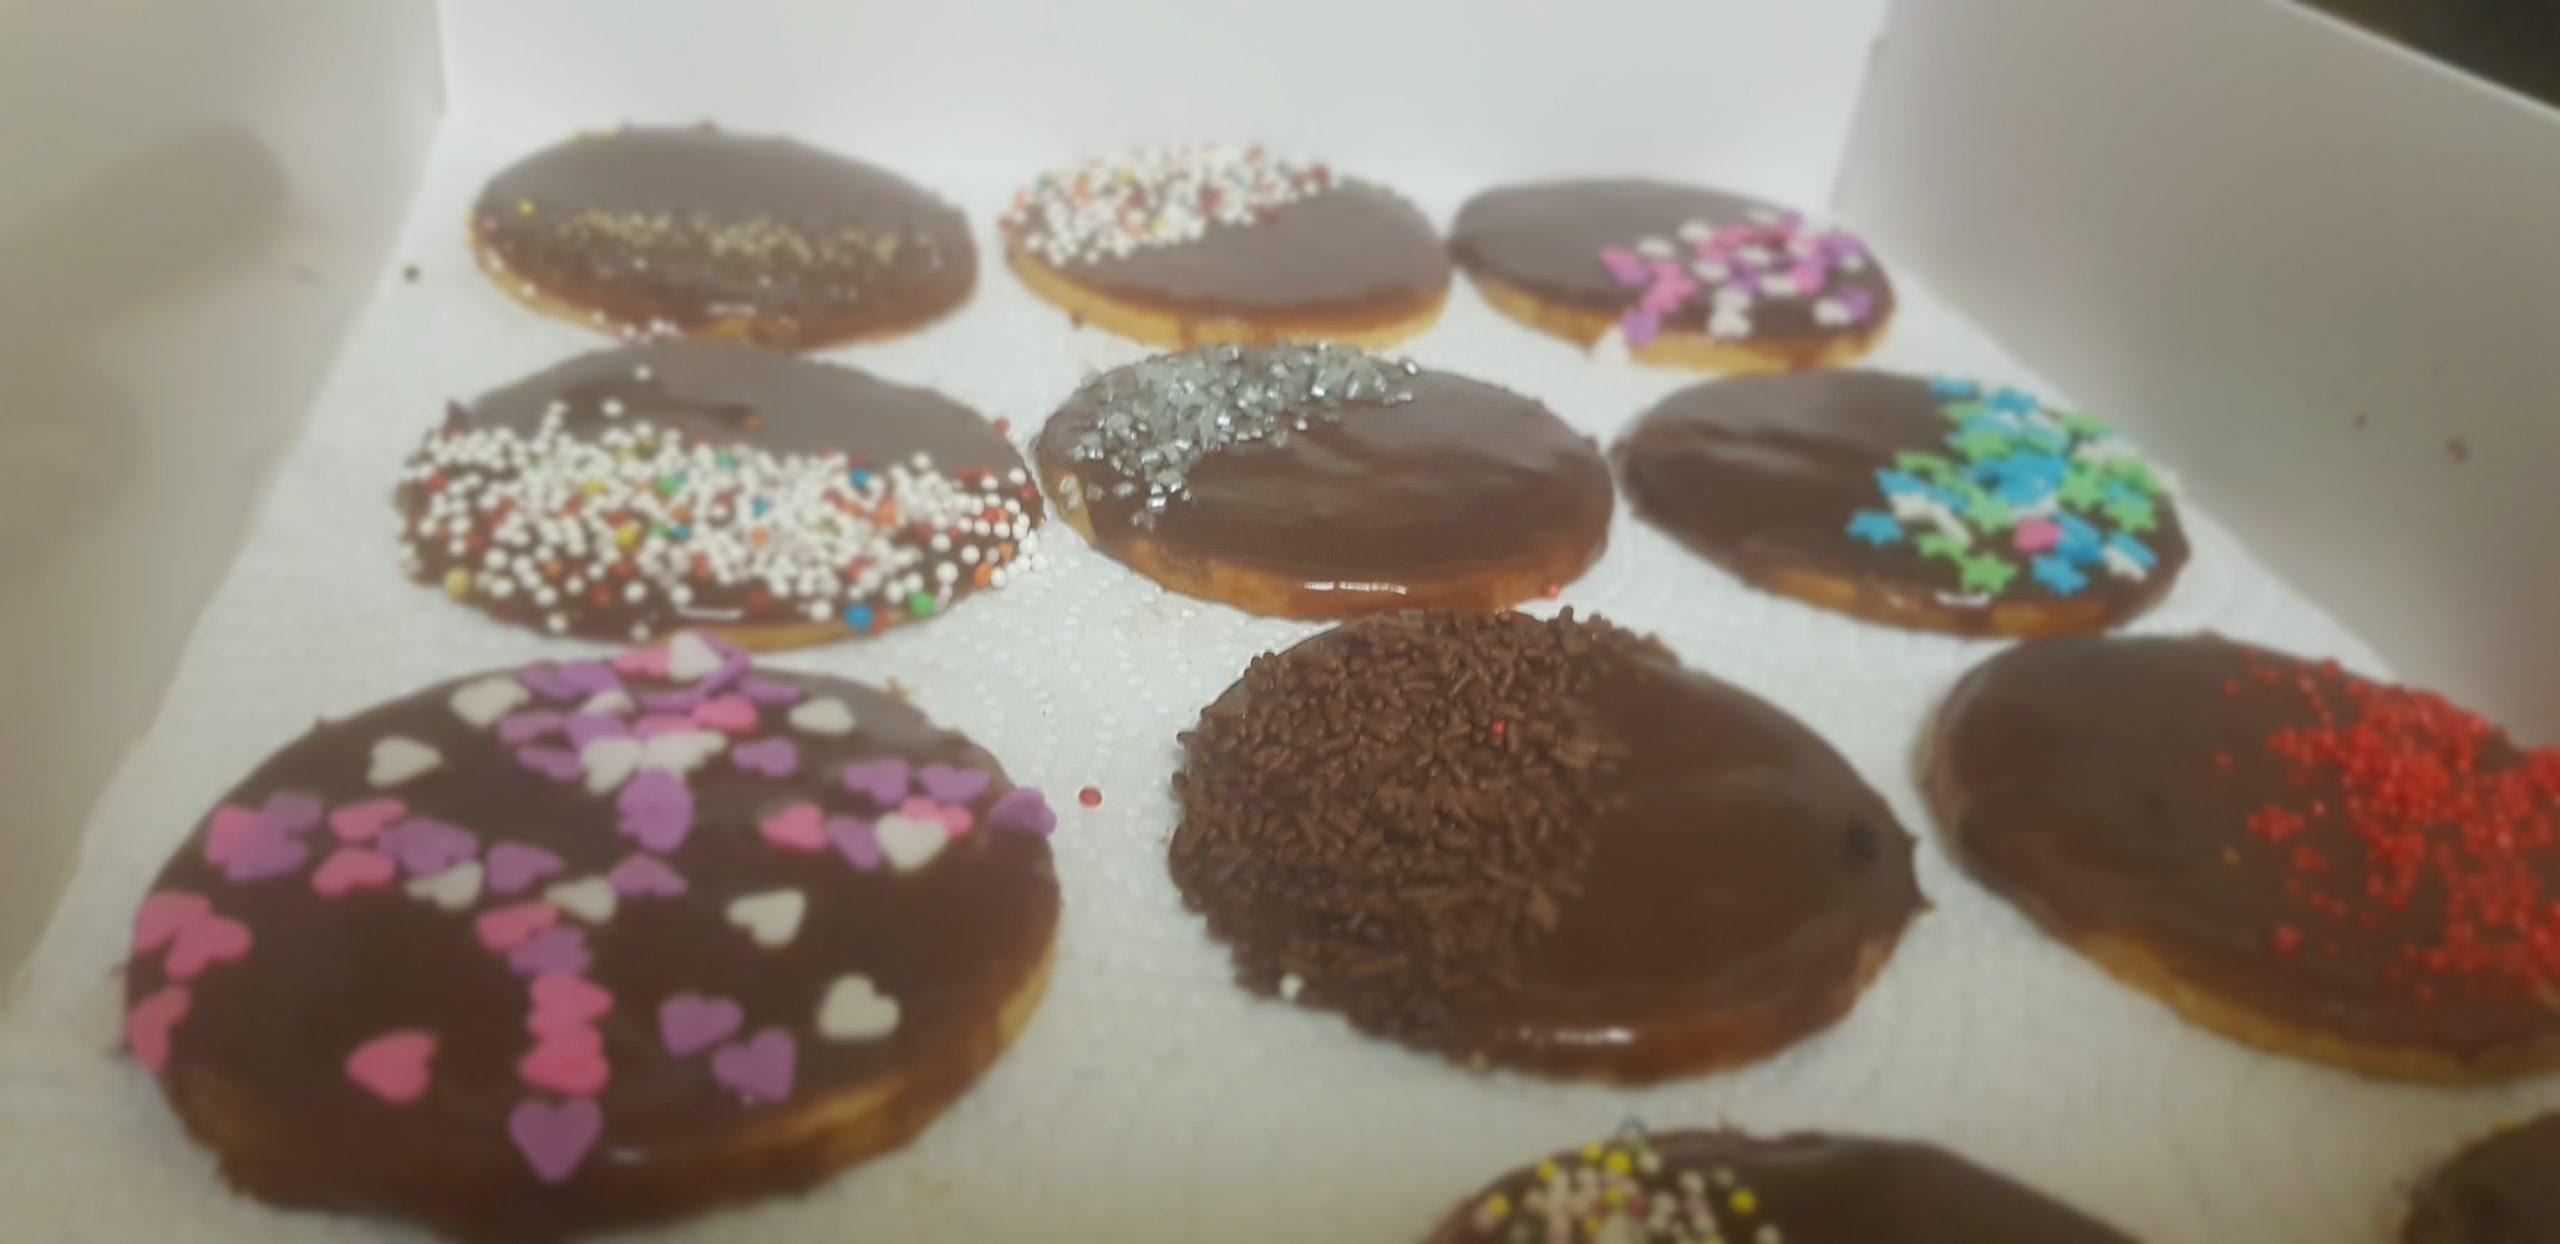 Les biscuits fondants très gourmands